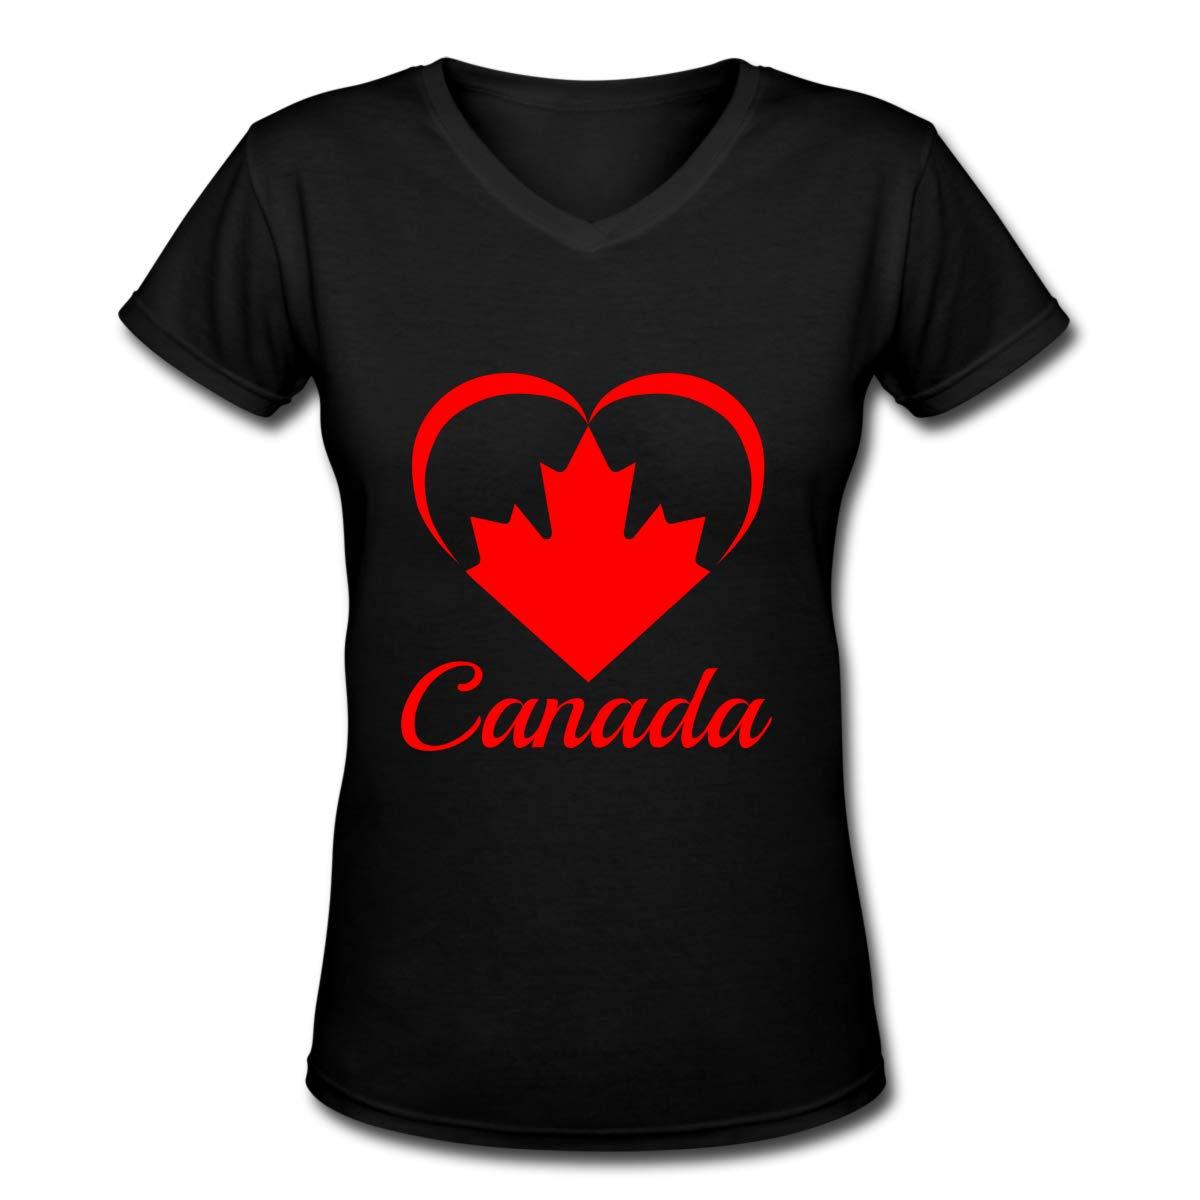 Canada text Ladies T-Shirt